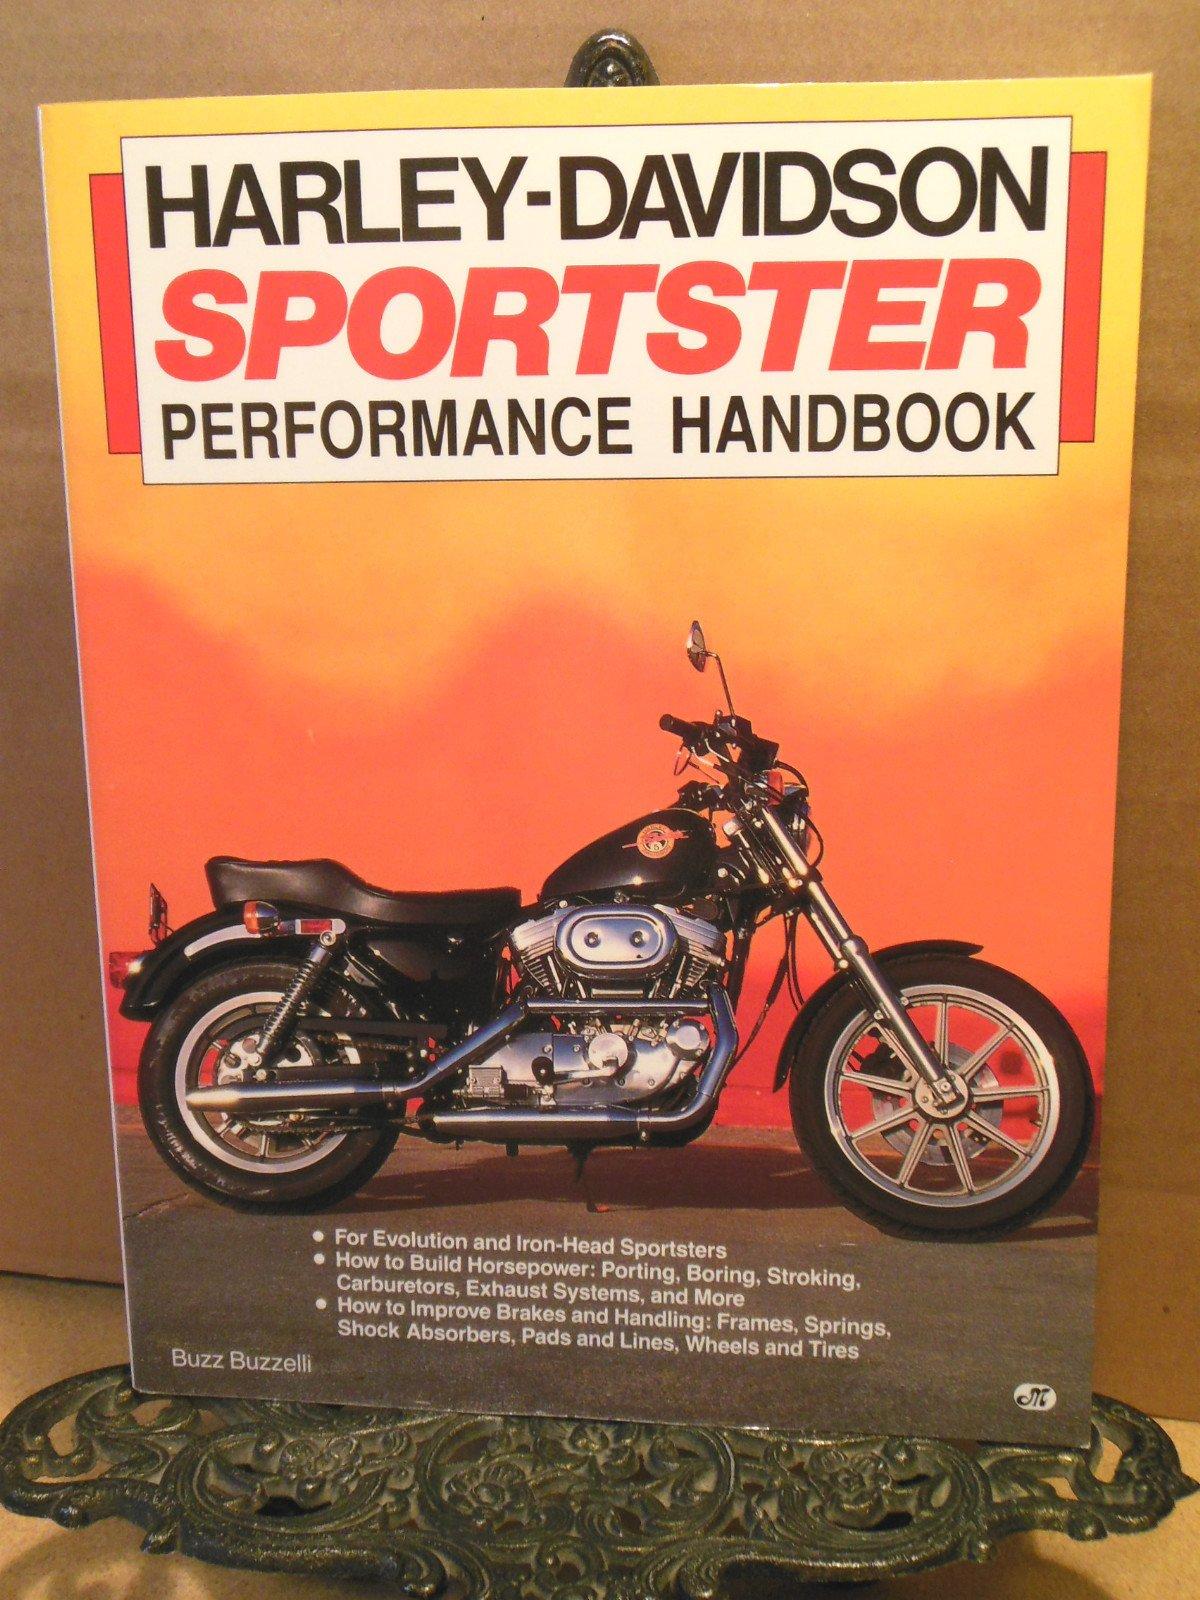 Harley-Davidson Sportster Performance Handbook (Performance Handbook Series)